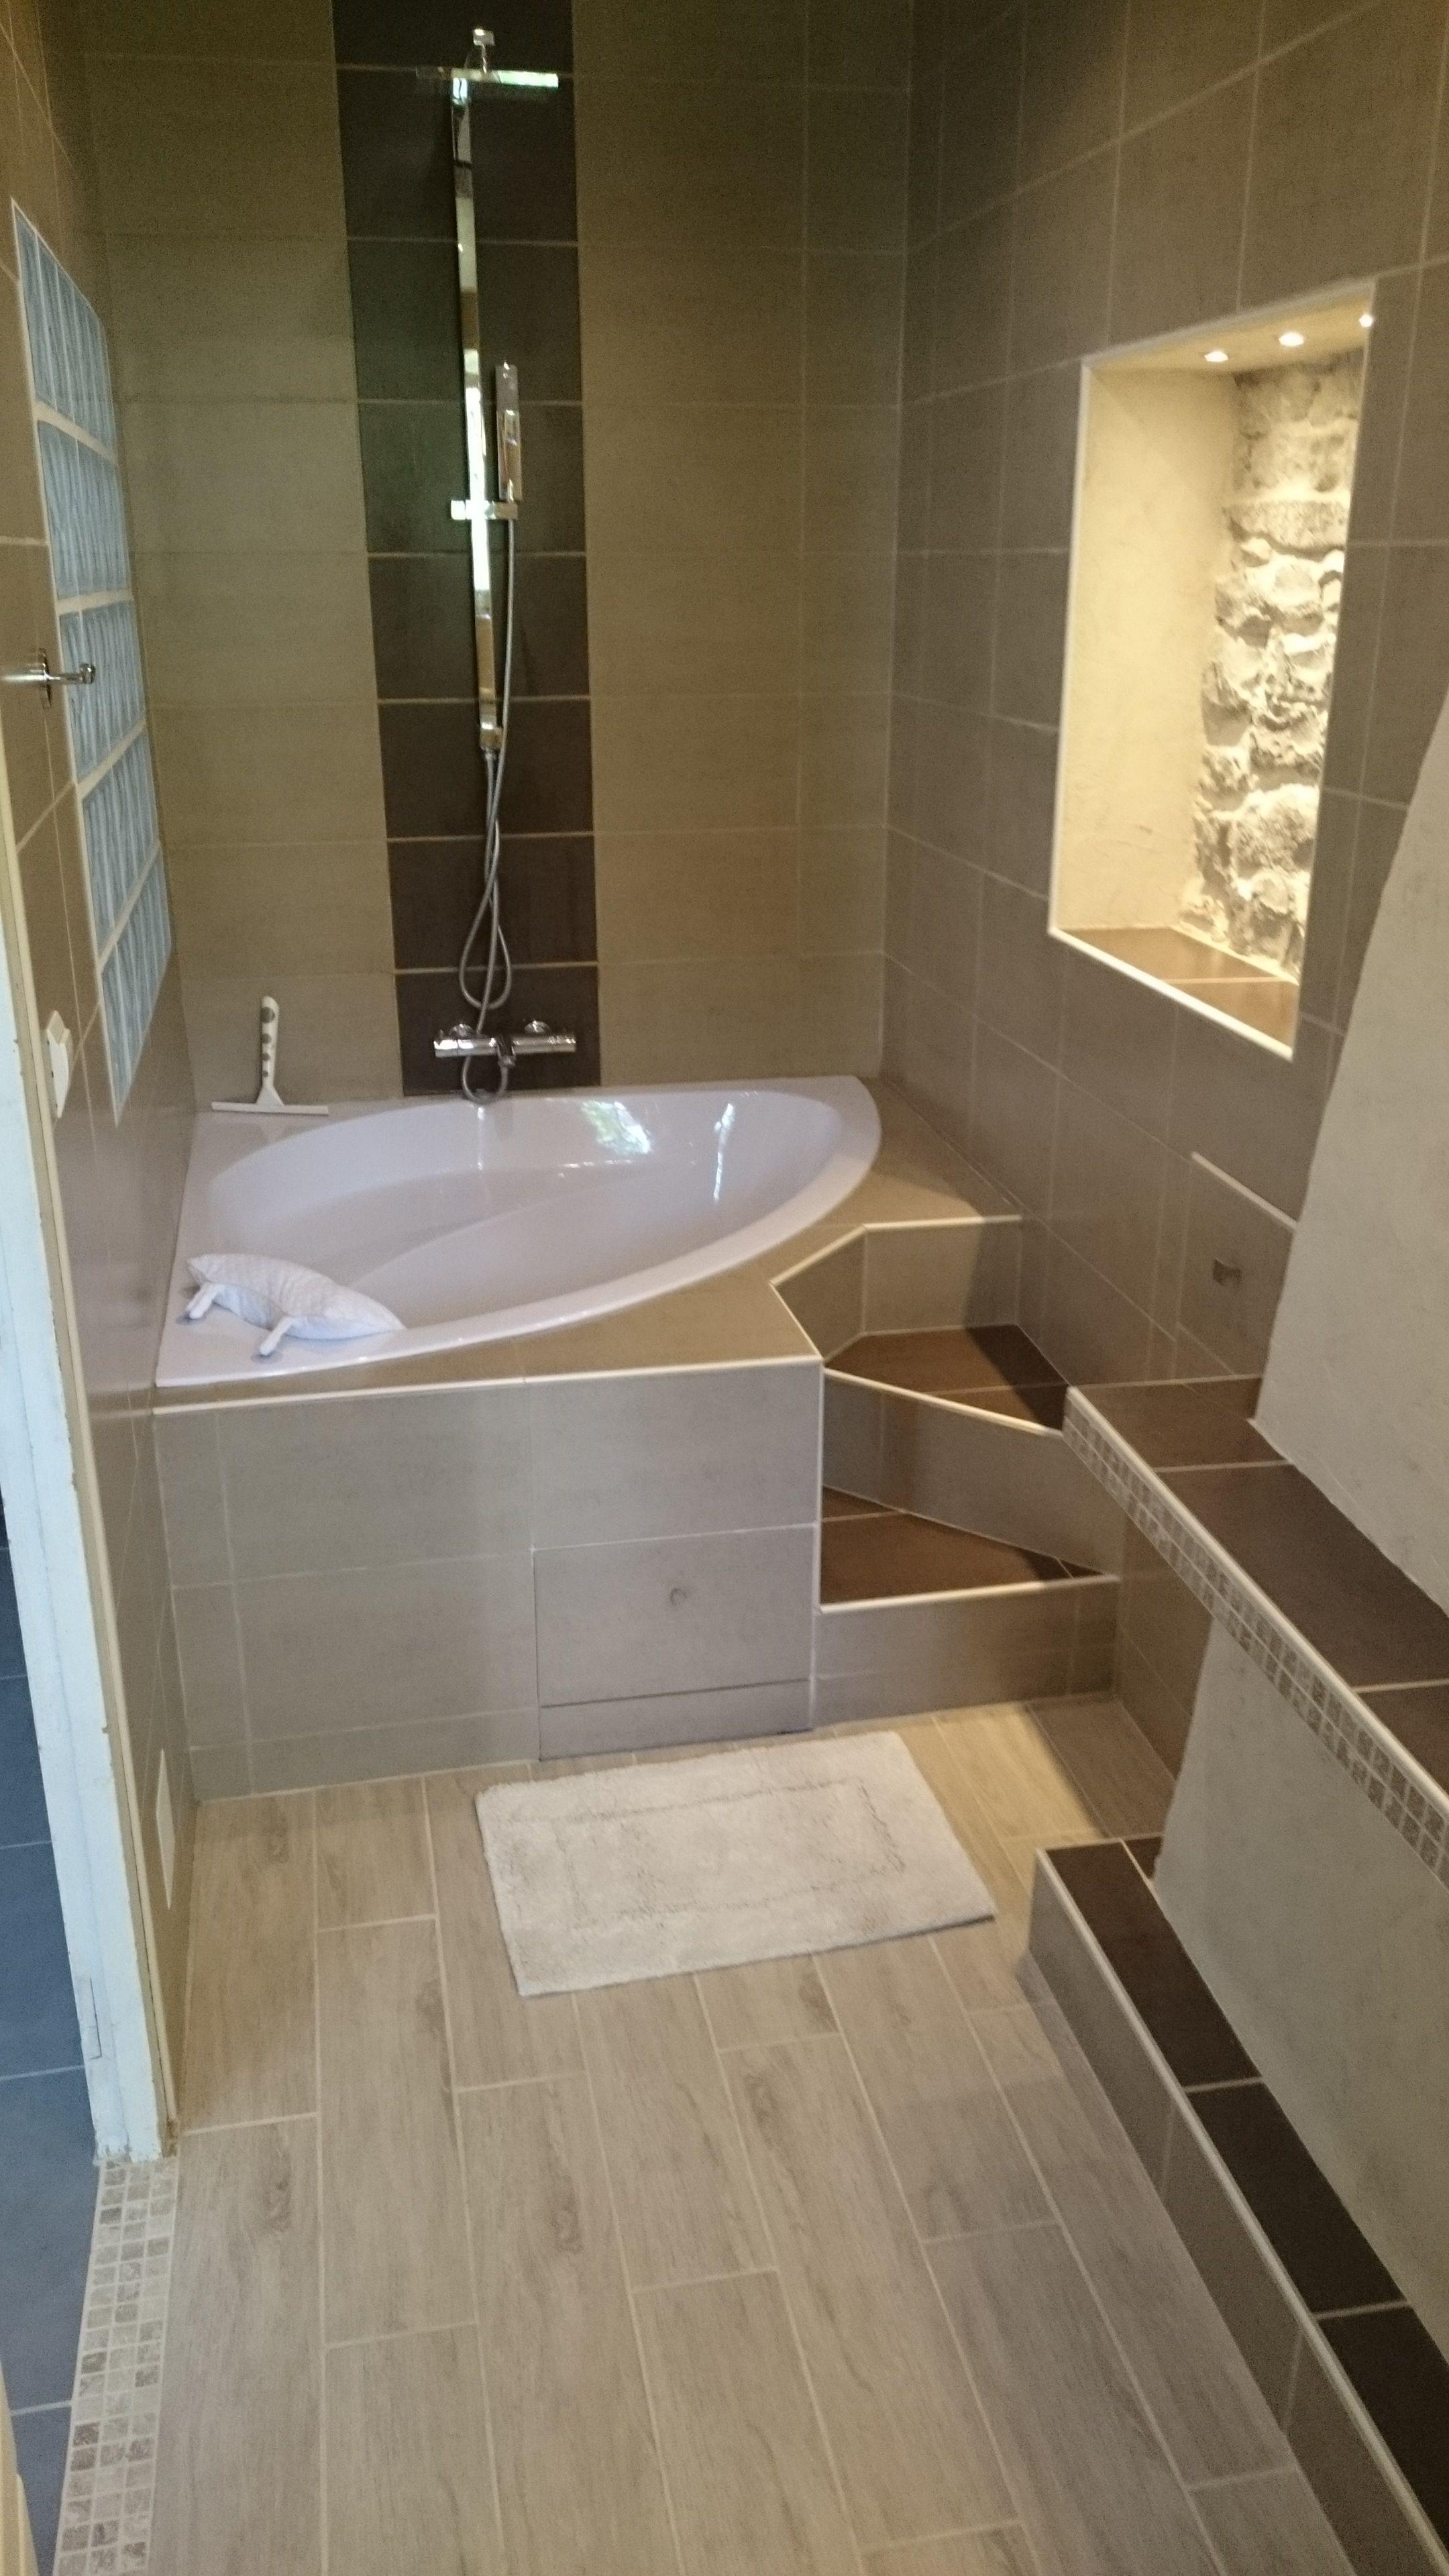 Comment Habiller Un Mur De Salle De Bain salle de bain de ma chambre parentale, coin douche-bain